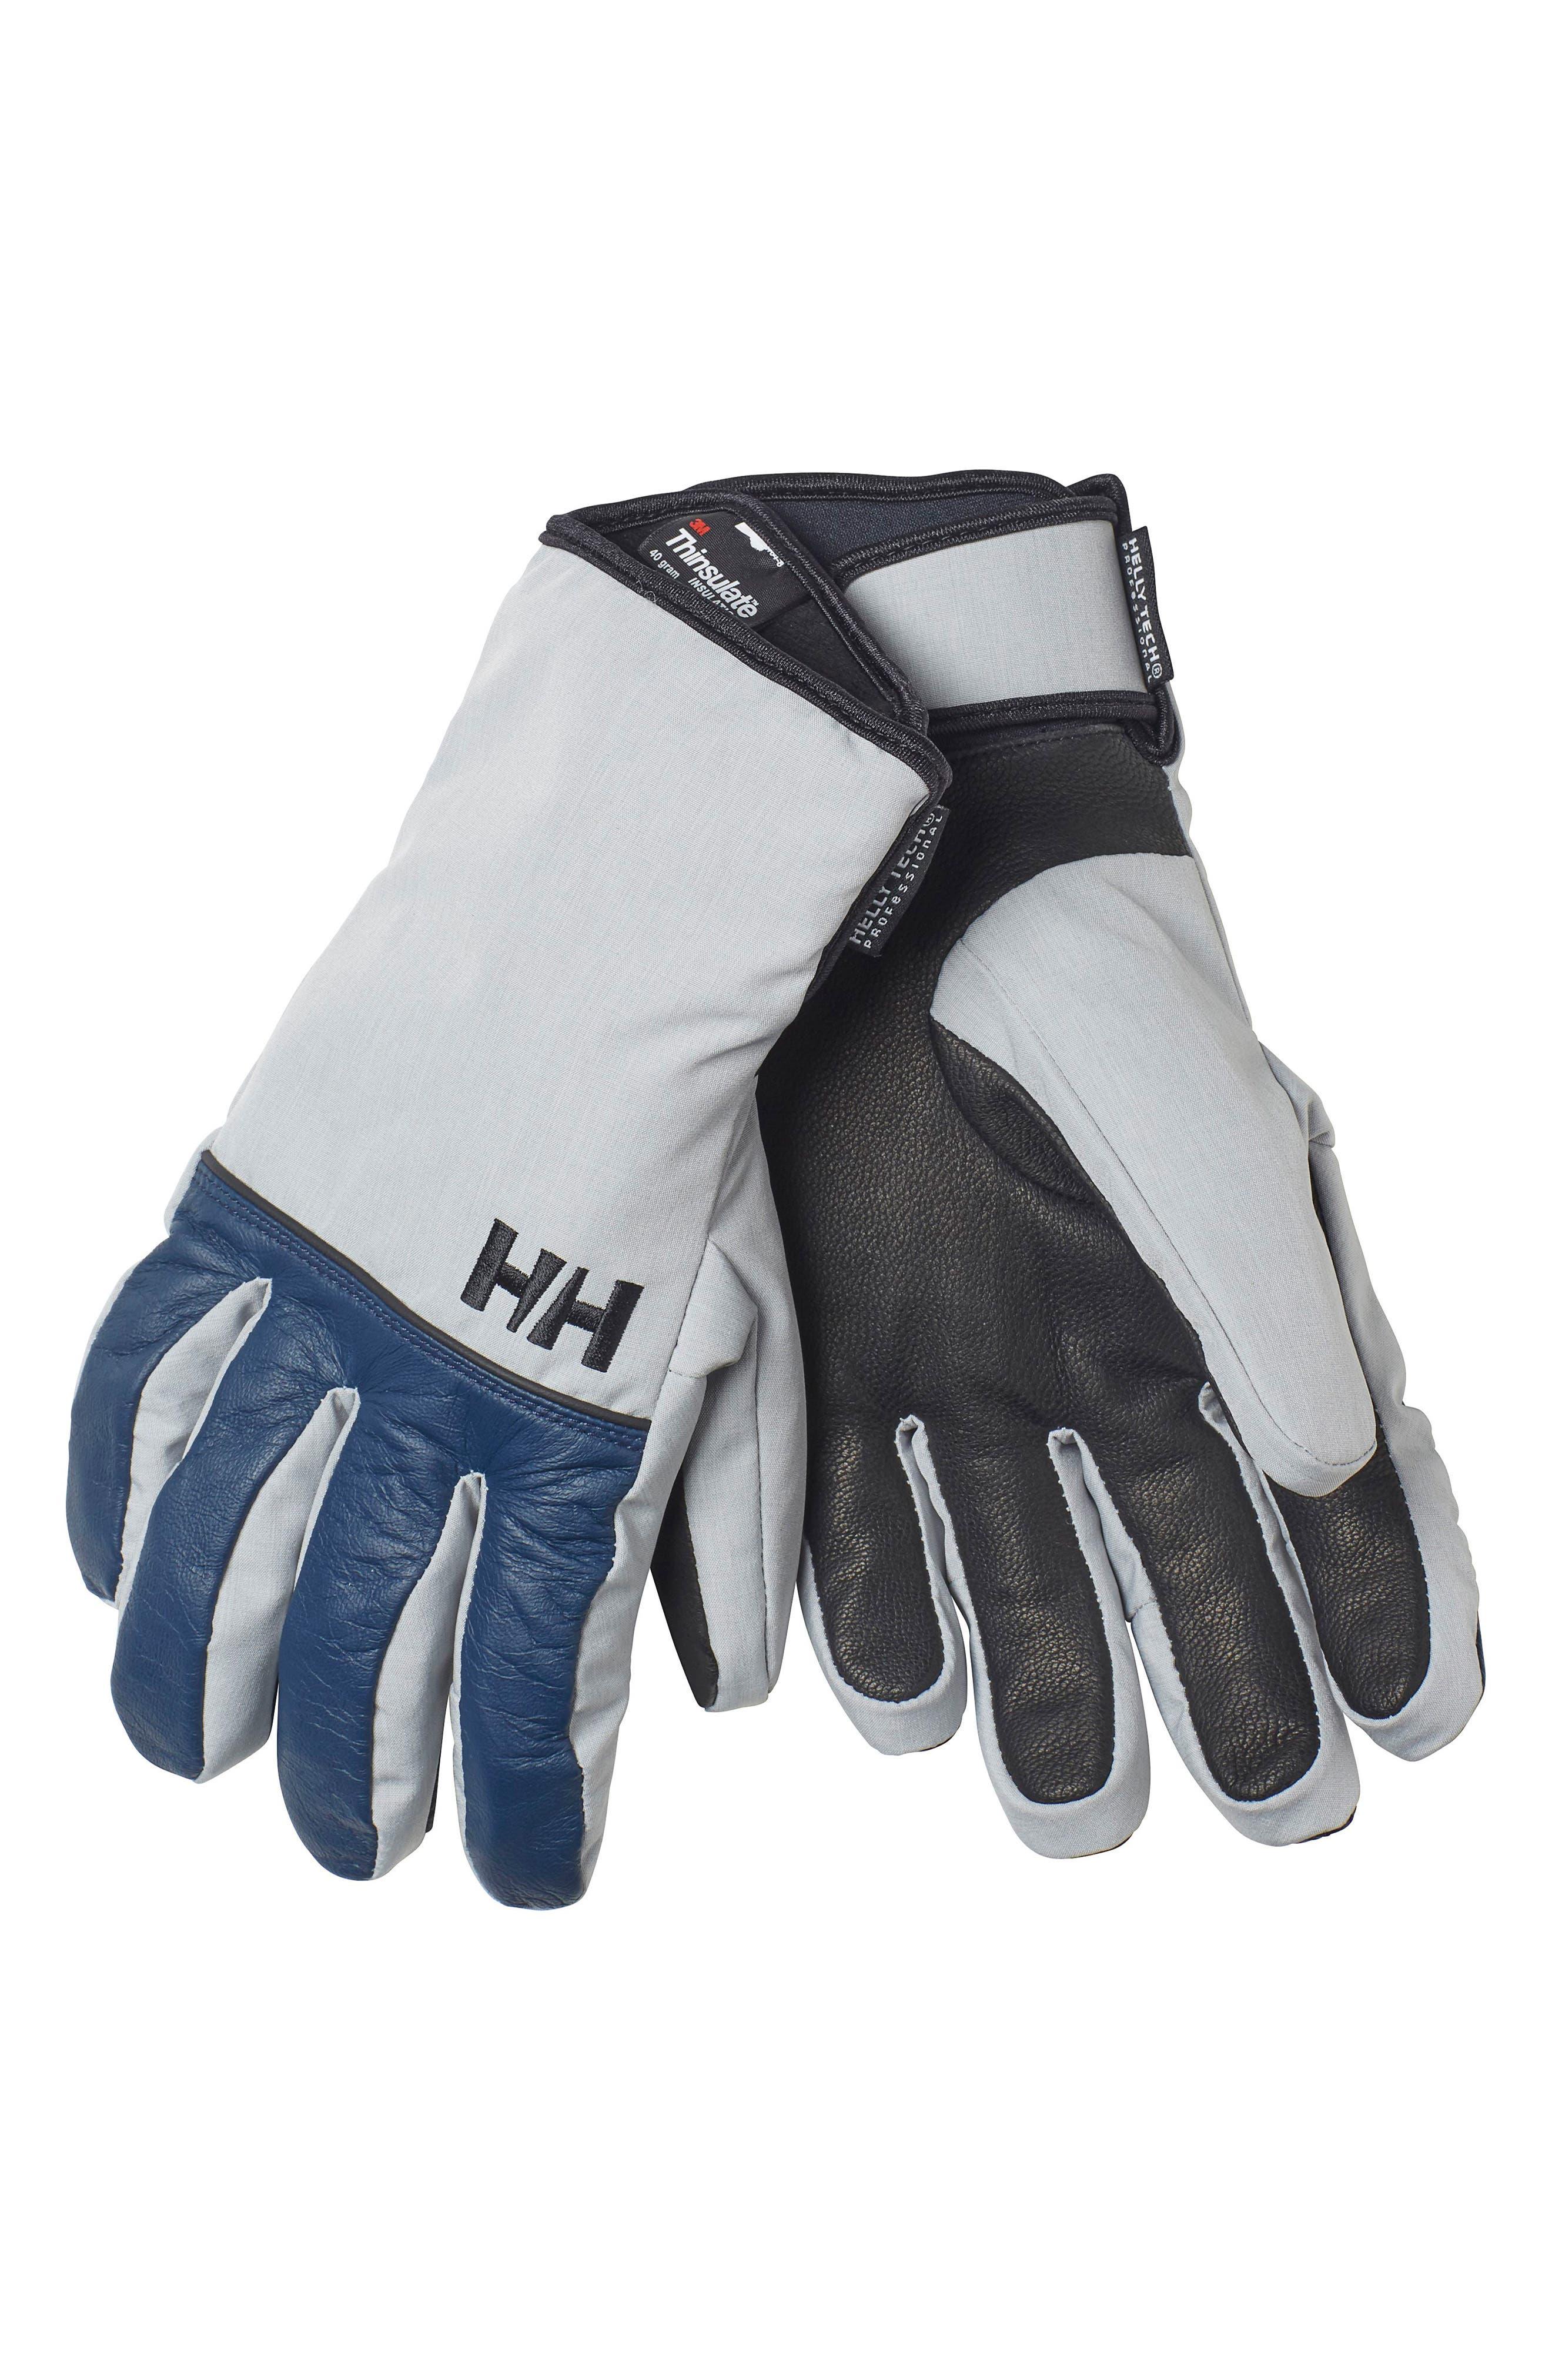 Helly Hansen Rogue HT Gloves